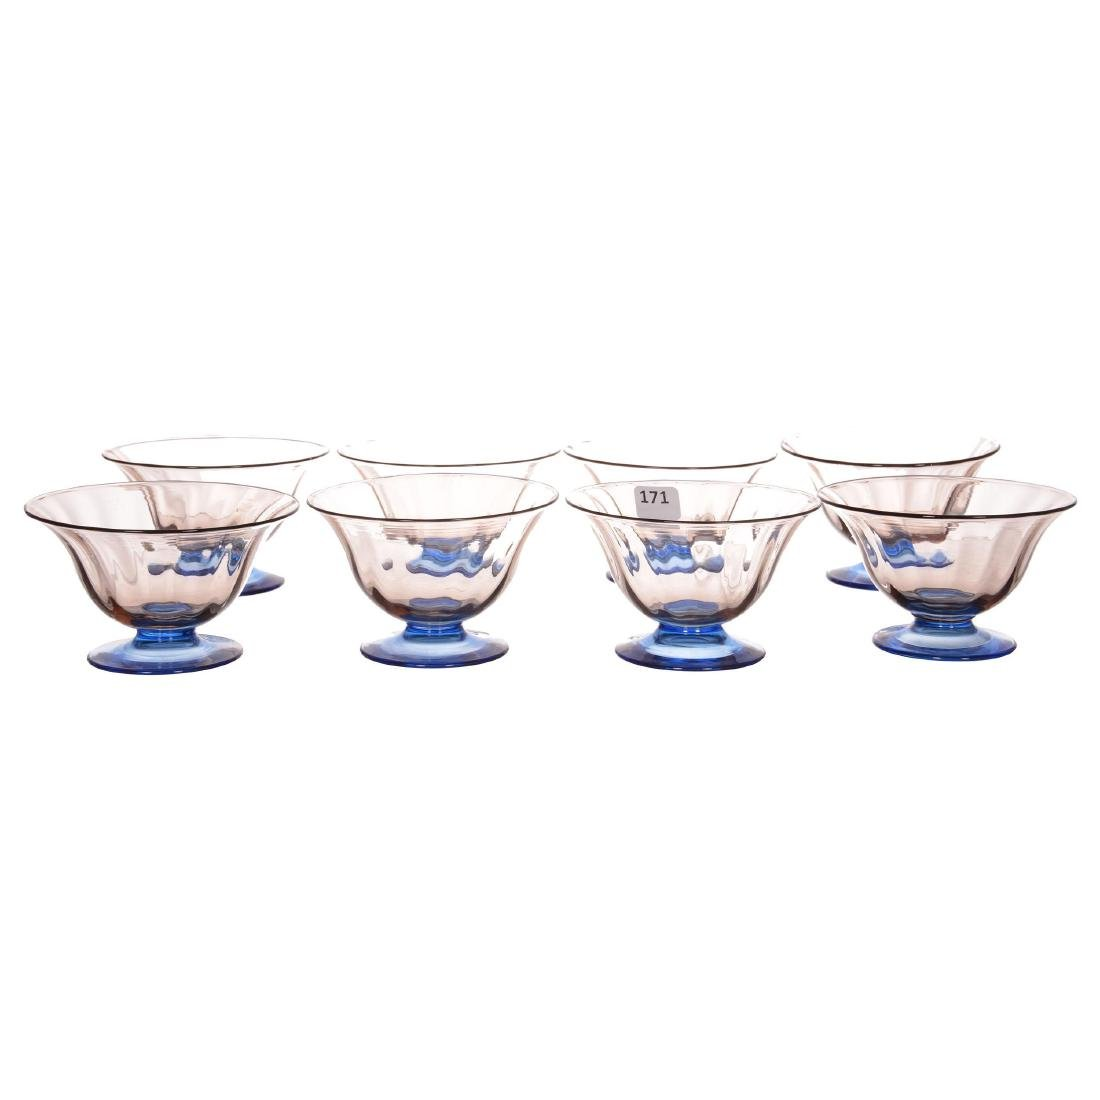 (8) Signed Steuben Art Glass Sherbets